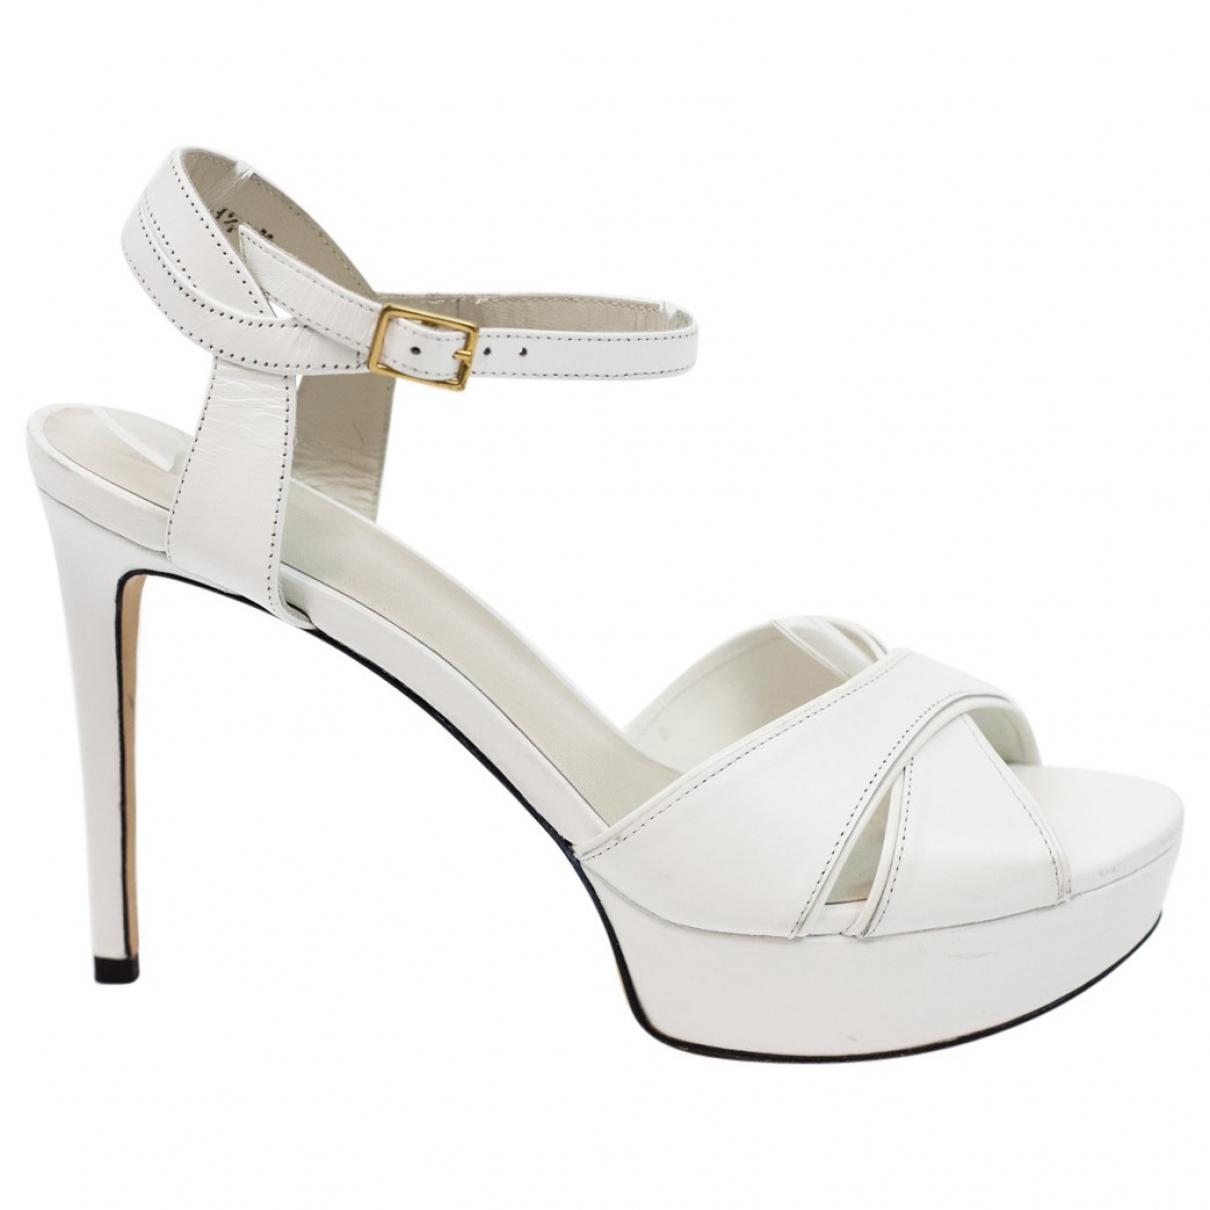 Pre-owned - Leather heels Stuart Weitzman 0dIdoC5G1f